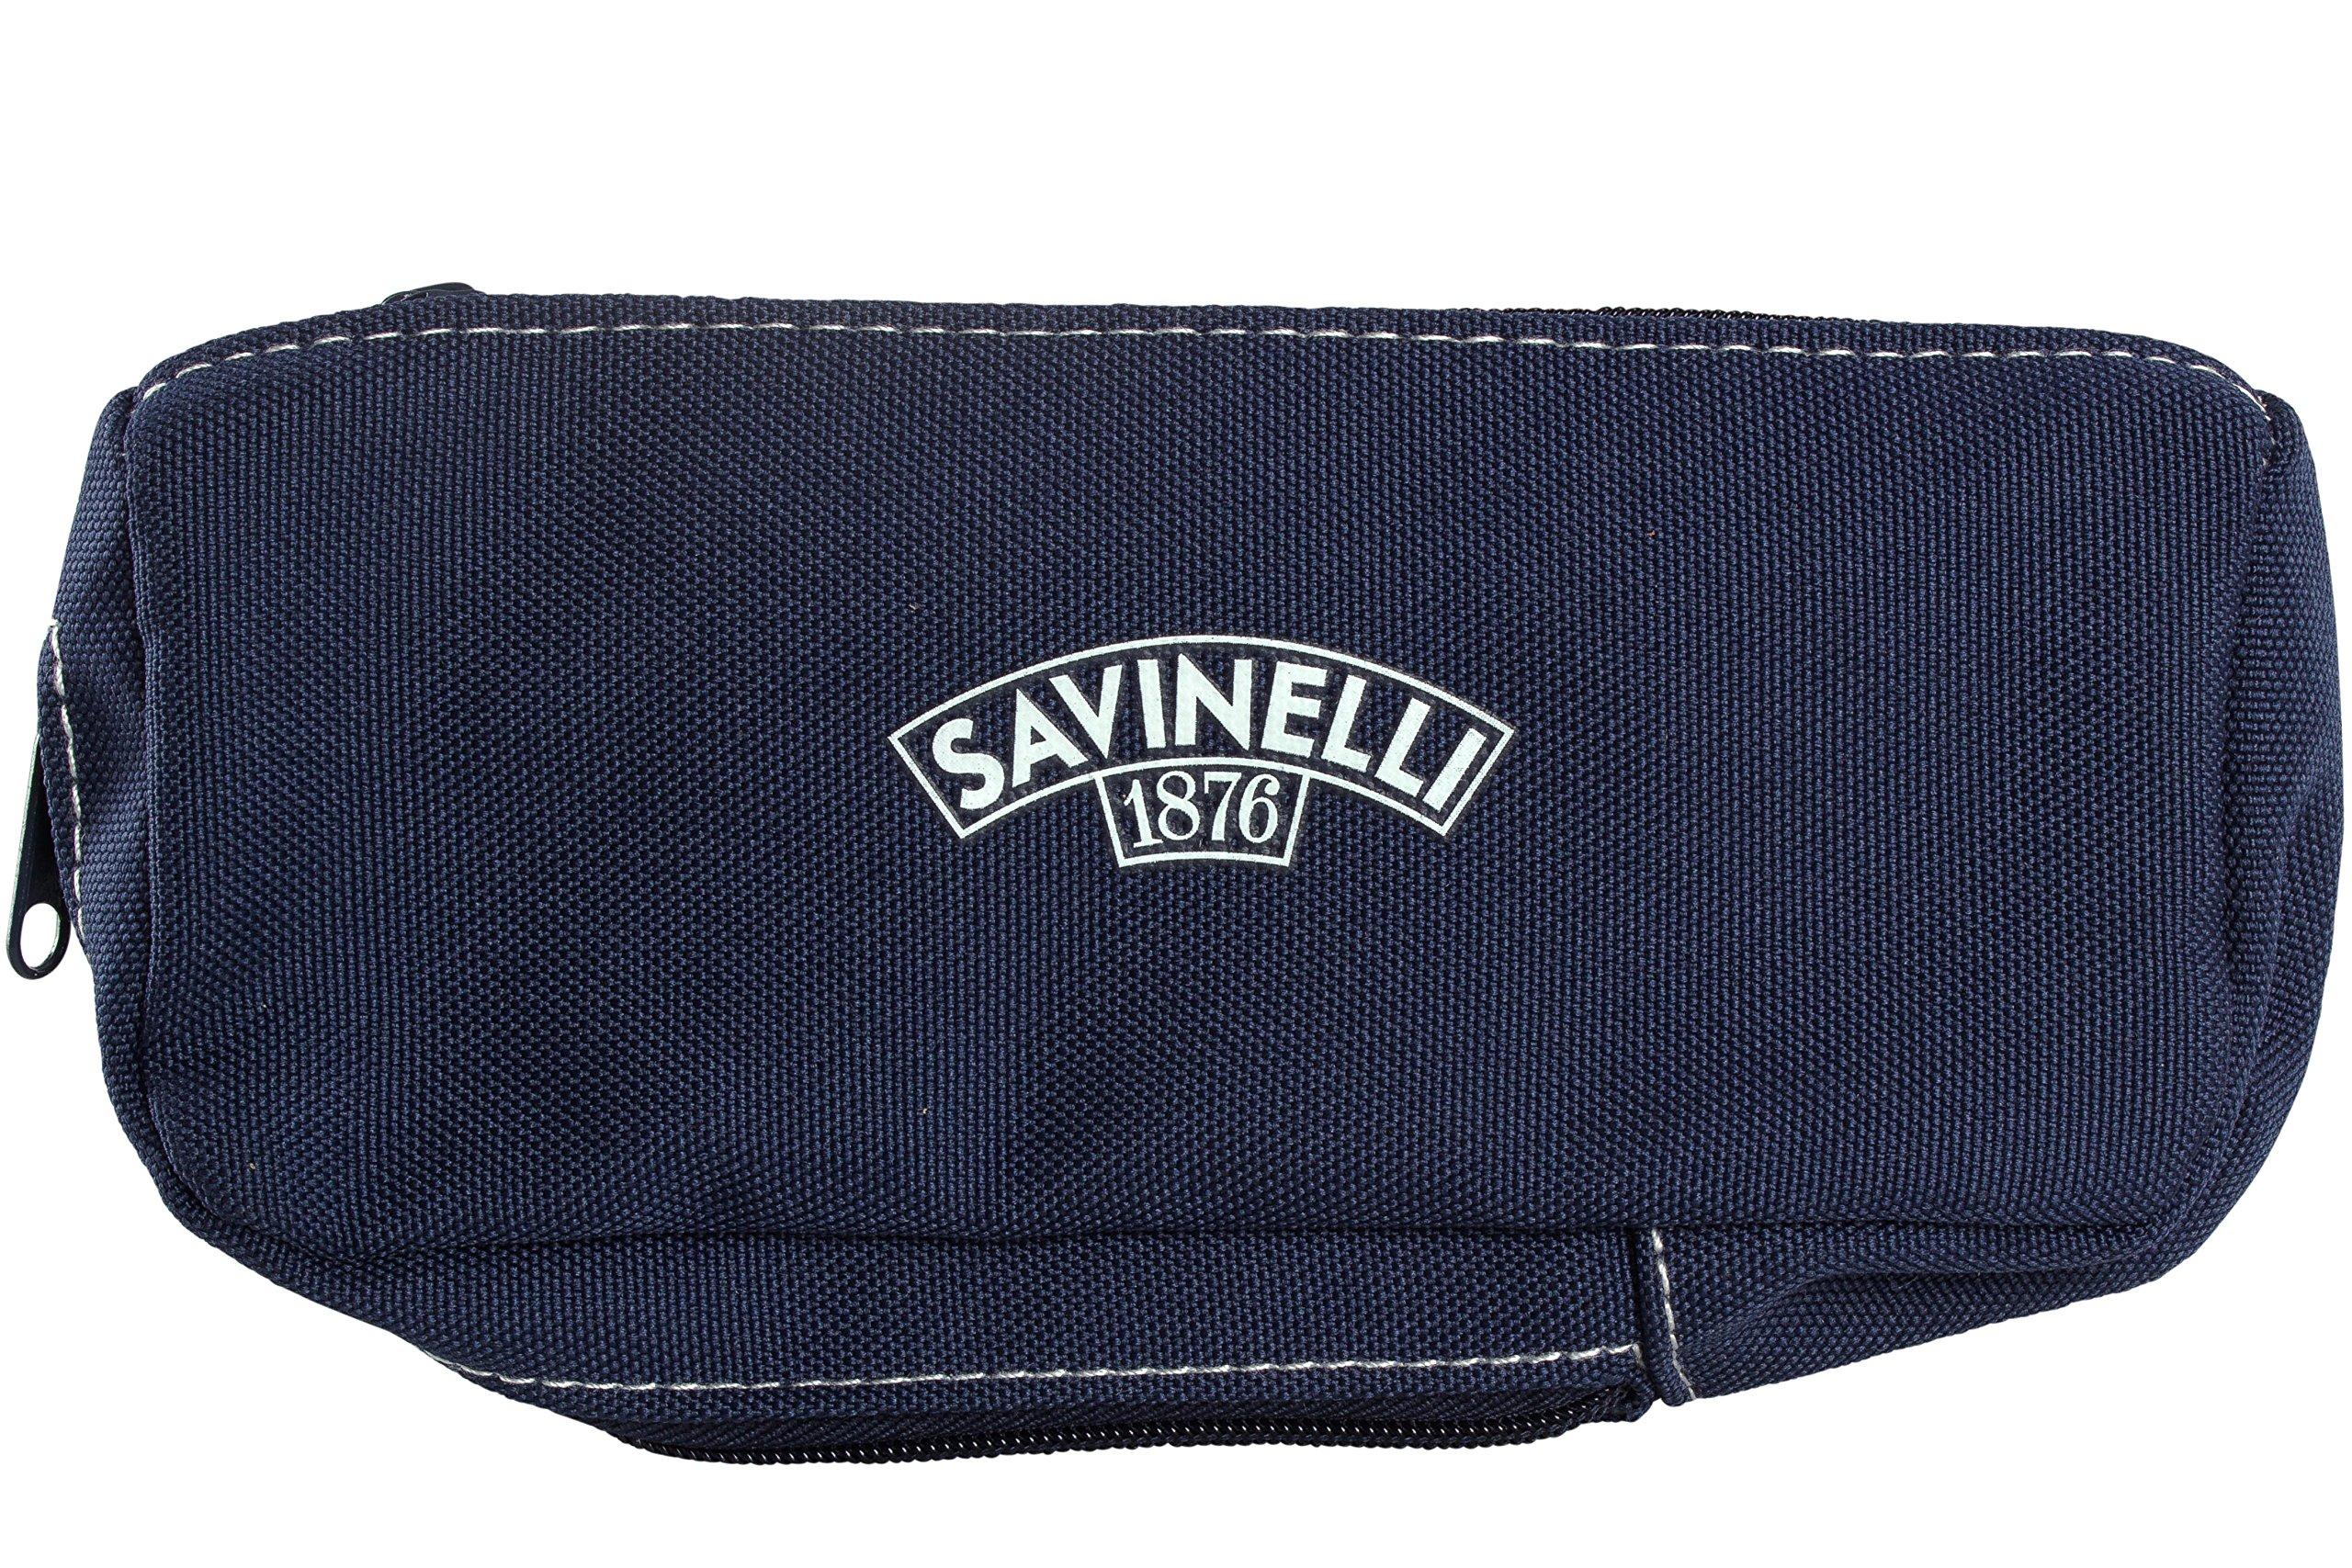 Savinelli Cloth Tobacco And Pipe Pouch (blue)